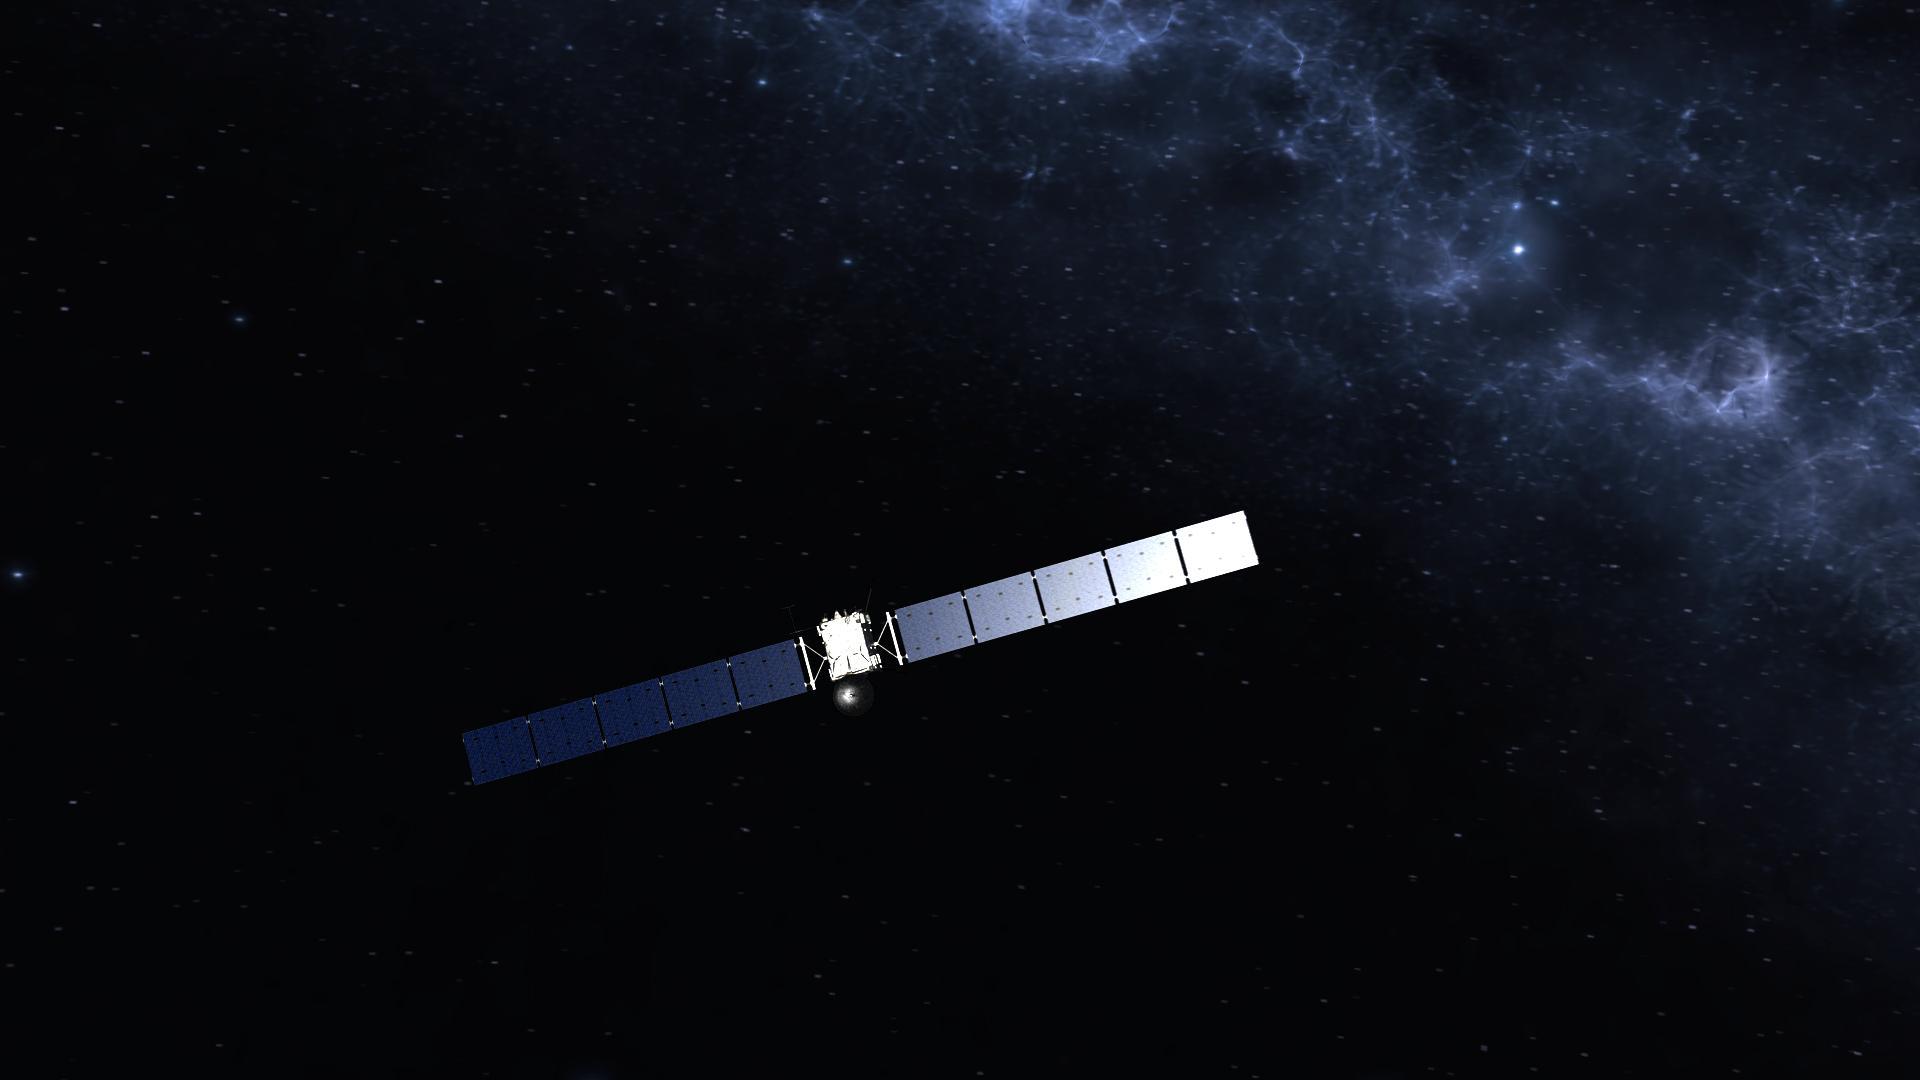 european space agency's rosetta spacecraft - HD1440×810